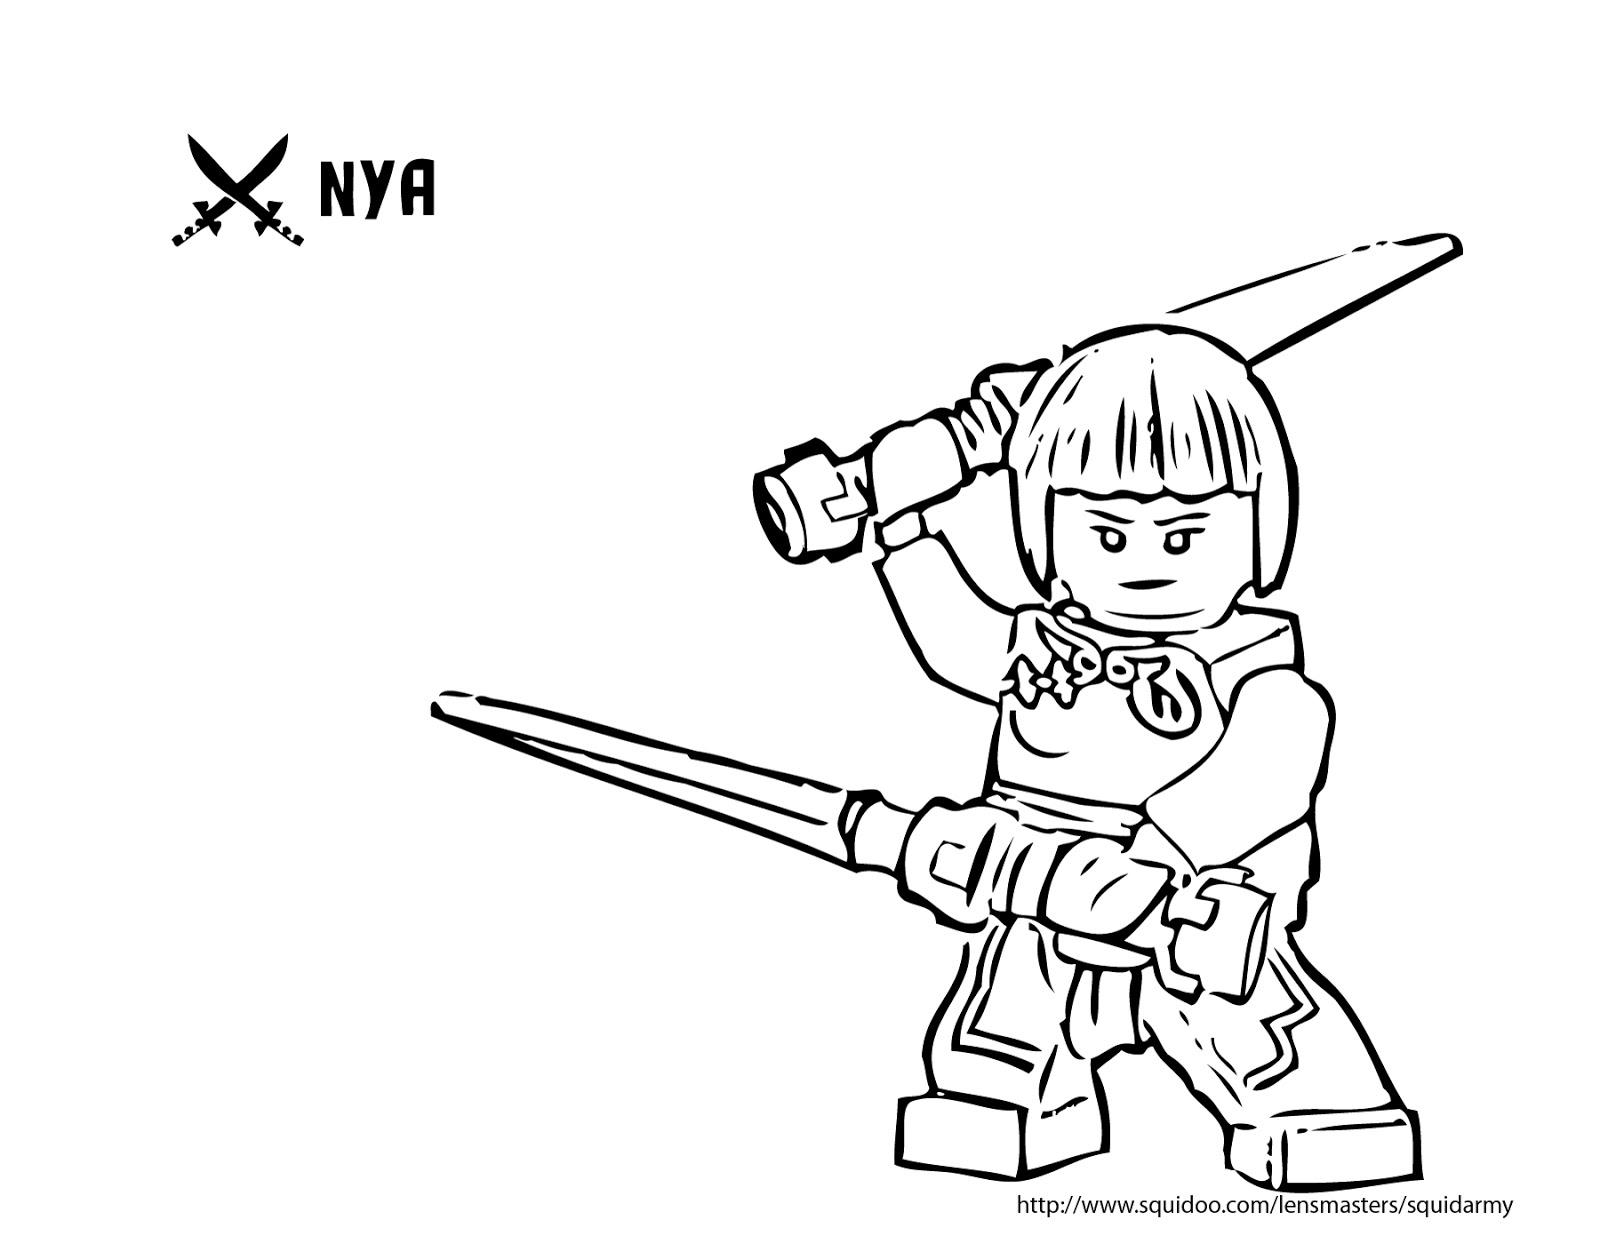 Coloriage ninjago gratuit - dessin a imprimer #180